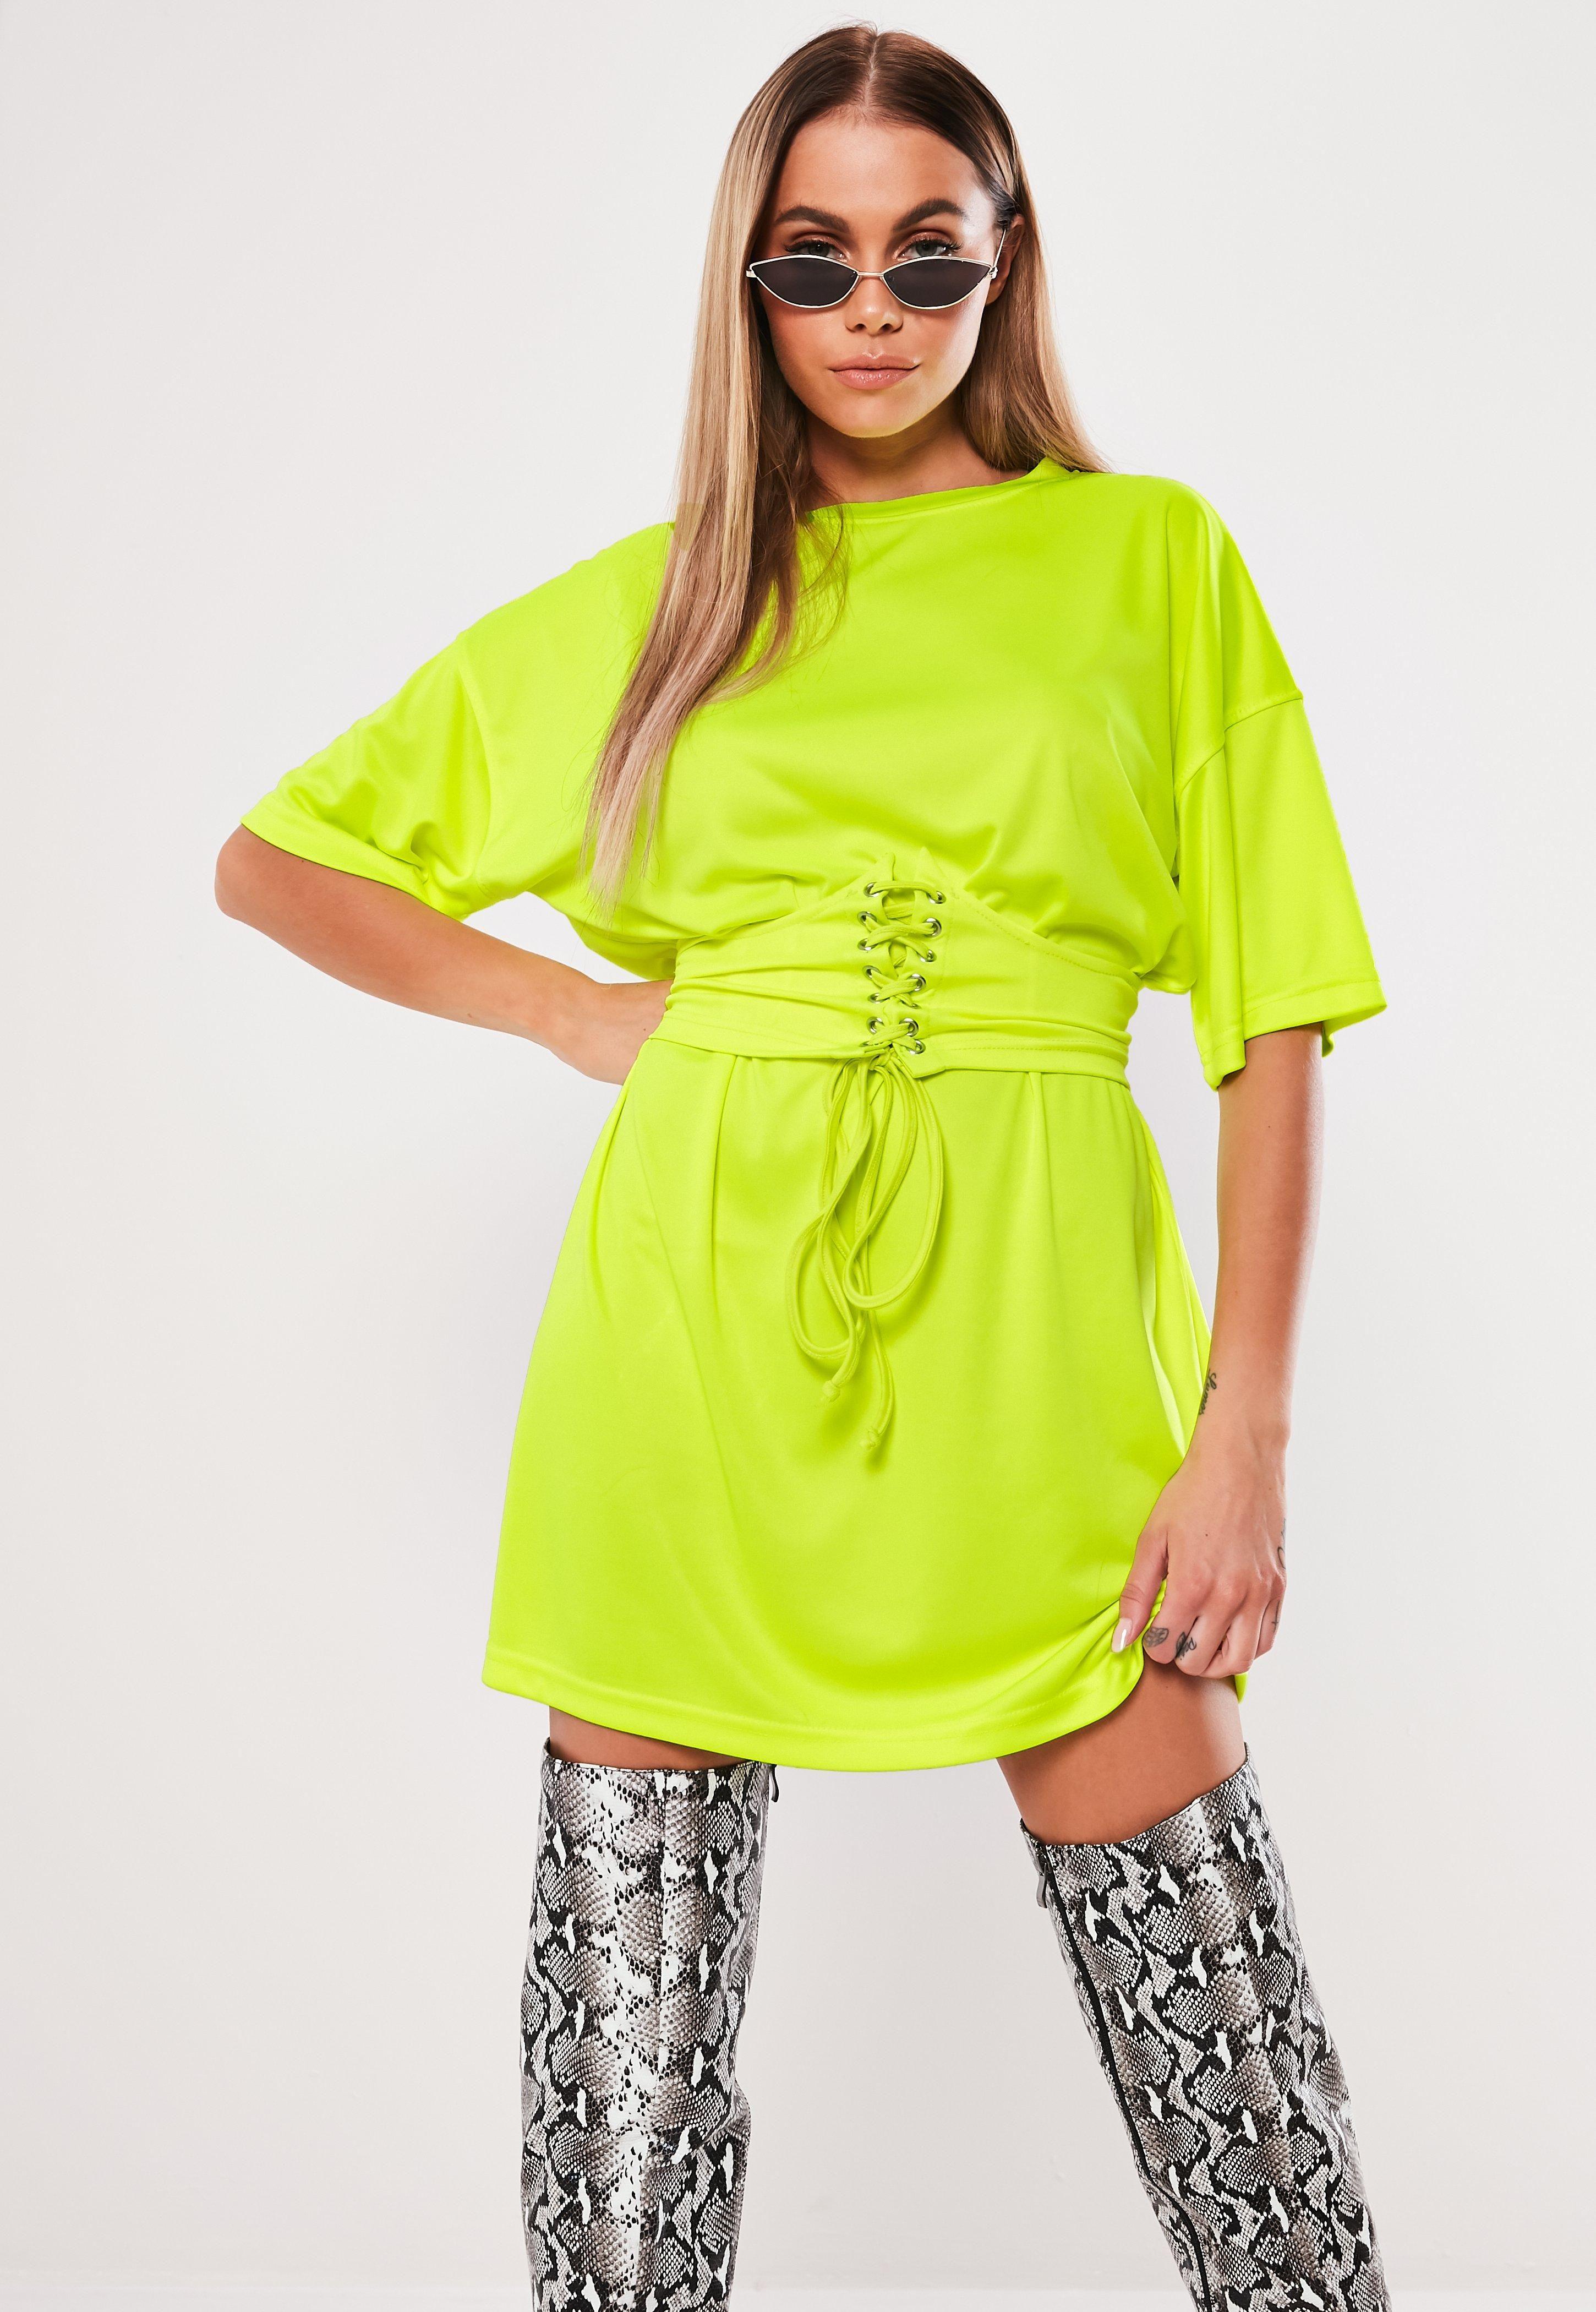 377deed2f9 Neon Yellow Oversized Corset T Shirt Dress #Sponsored #Oversized,  #Affiliate, #